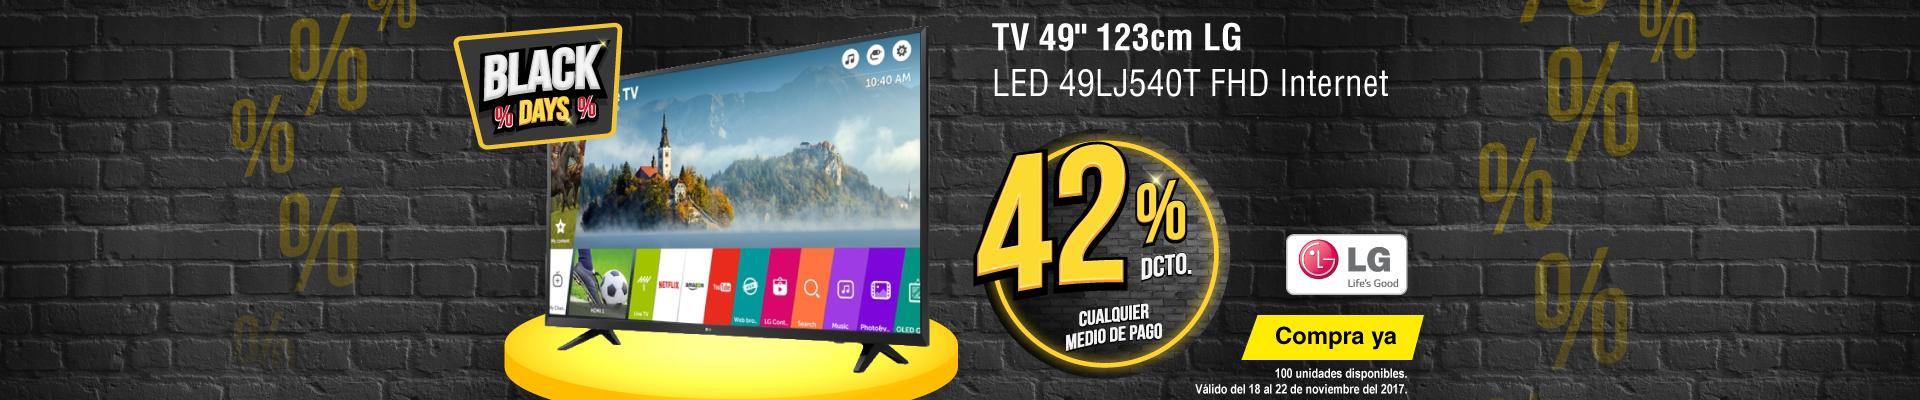 CAT ALKP-5-tv-TV 49 123cm LG LED 49LJ540T FHD Internet-prod-noviembre22